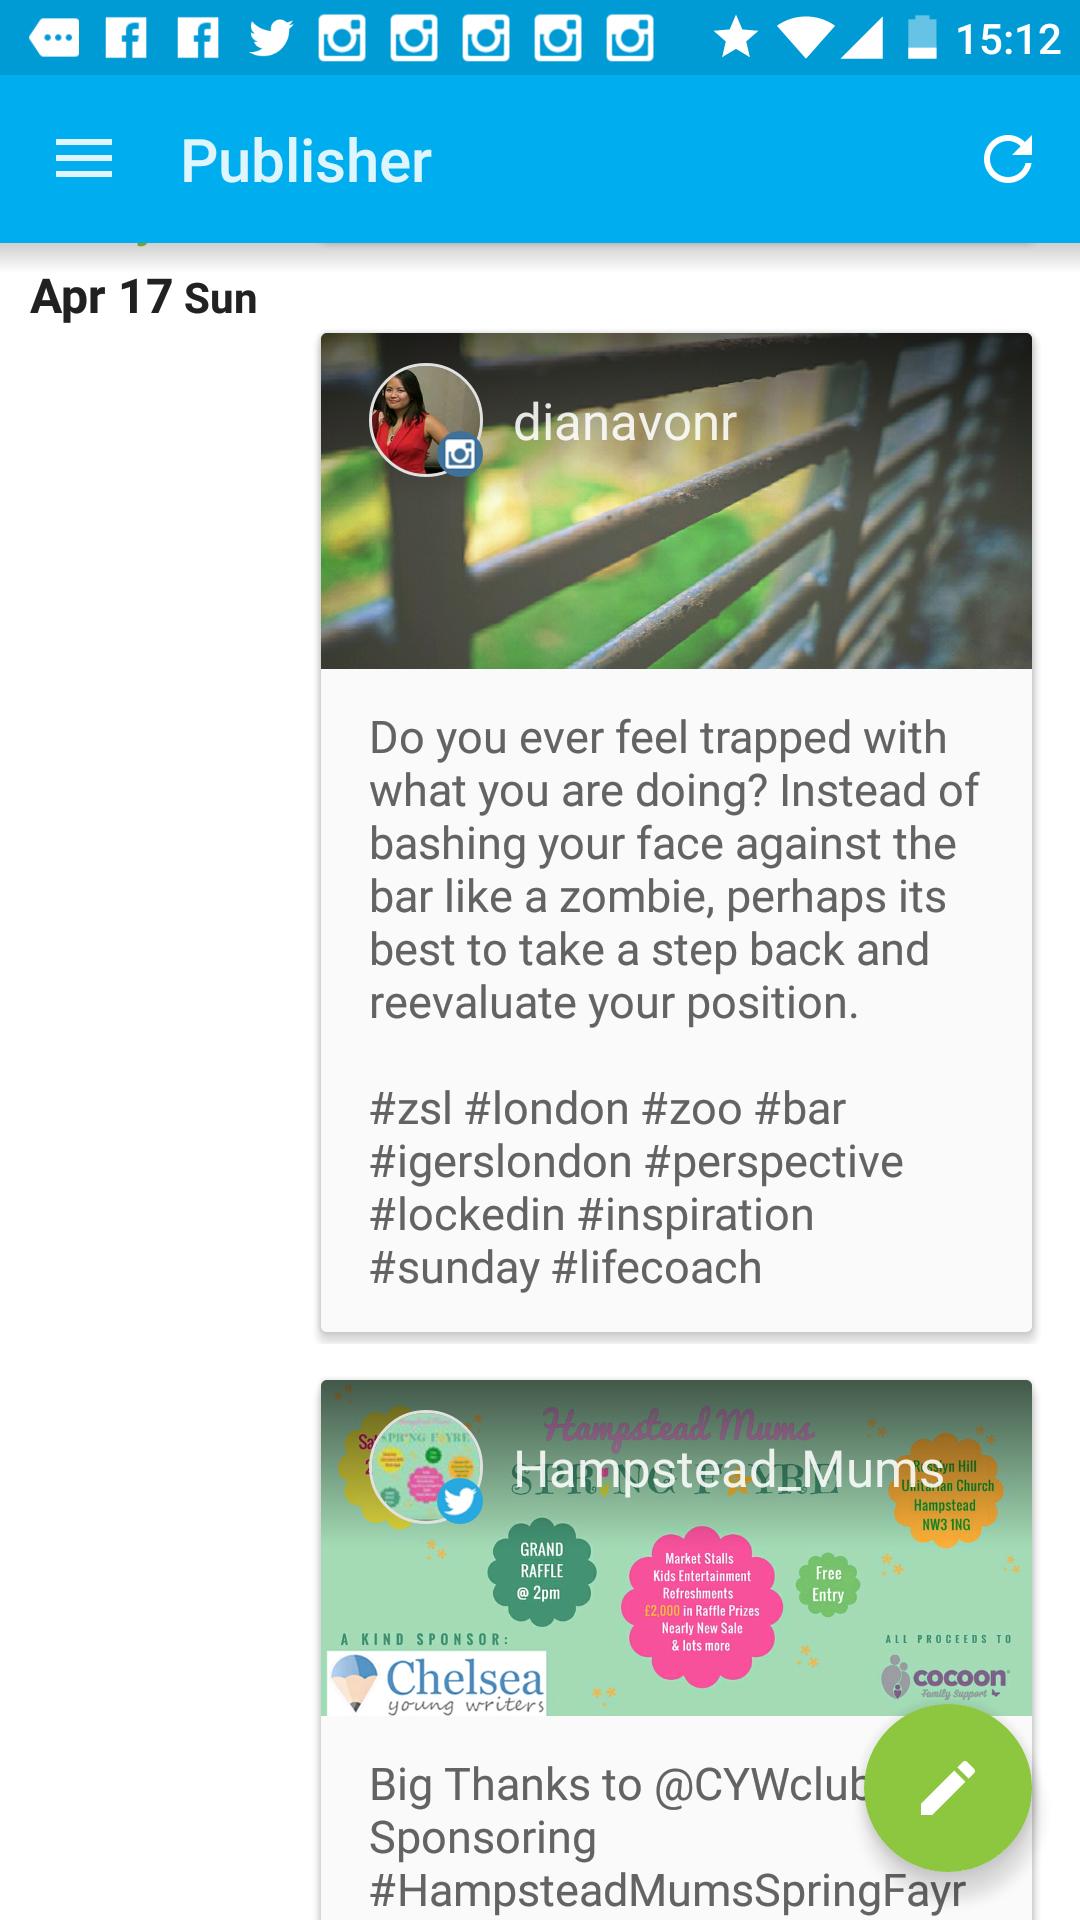 Hooteuite Instagram Apps DianavonR Social Media Tips